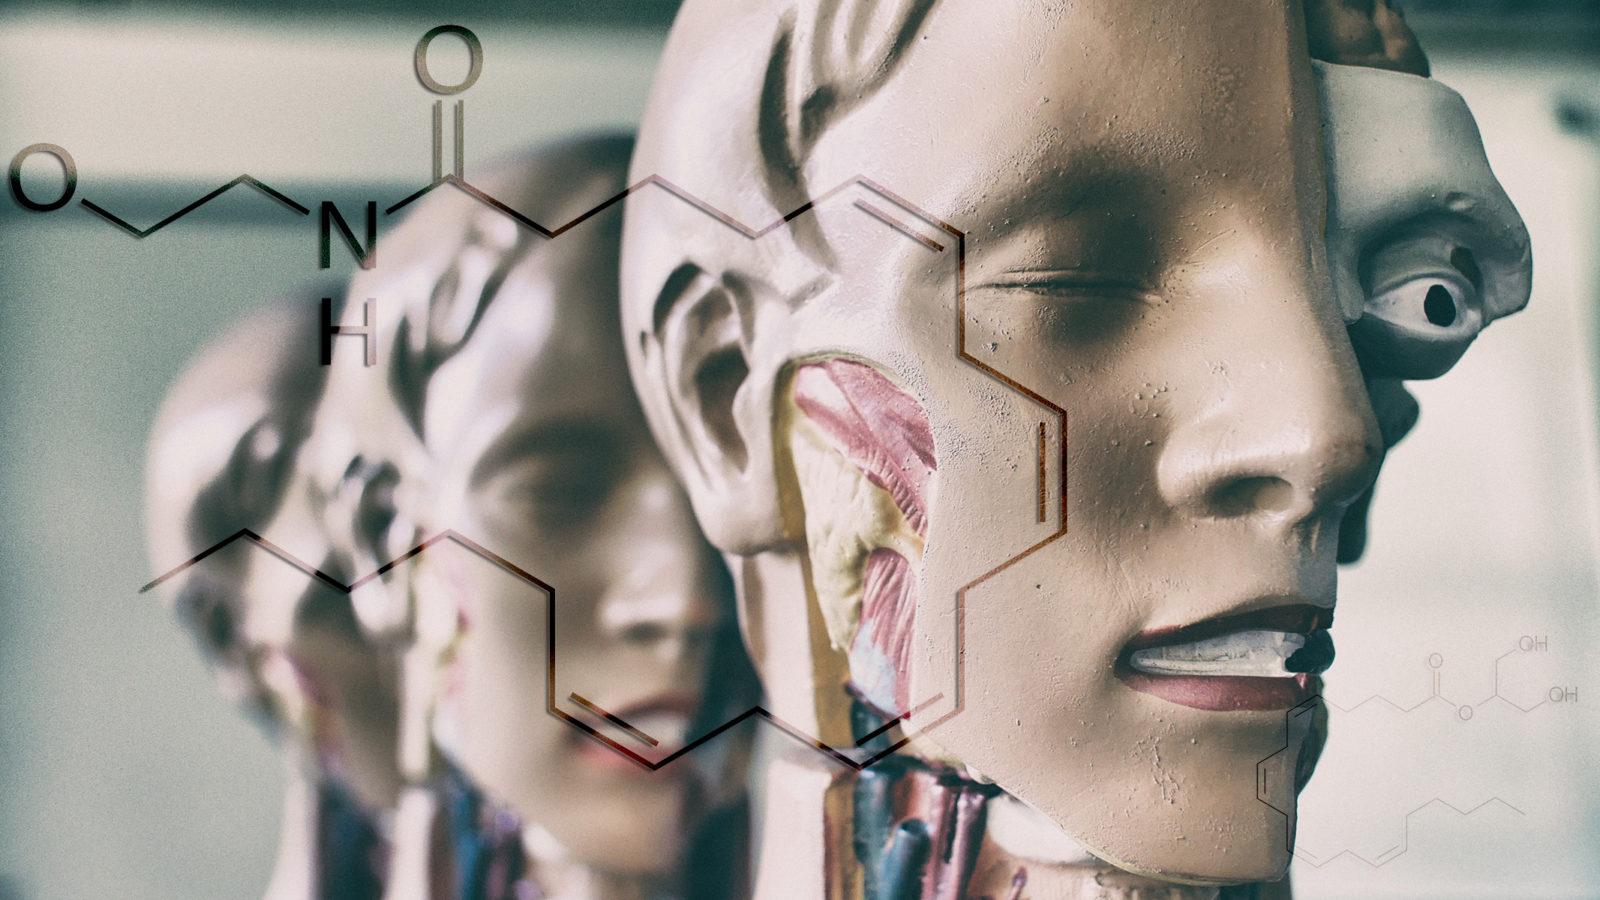 Explaining Cannabinoids Part II: The Endocannabinoid System